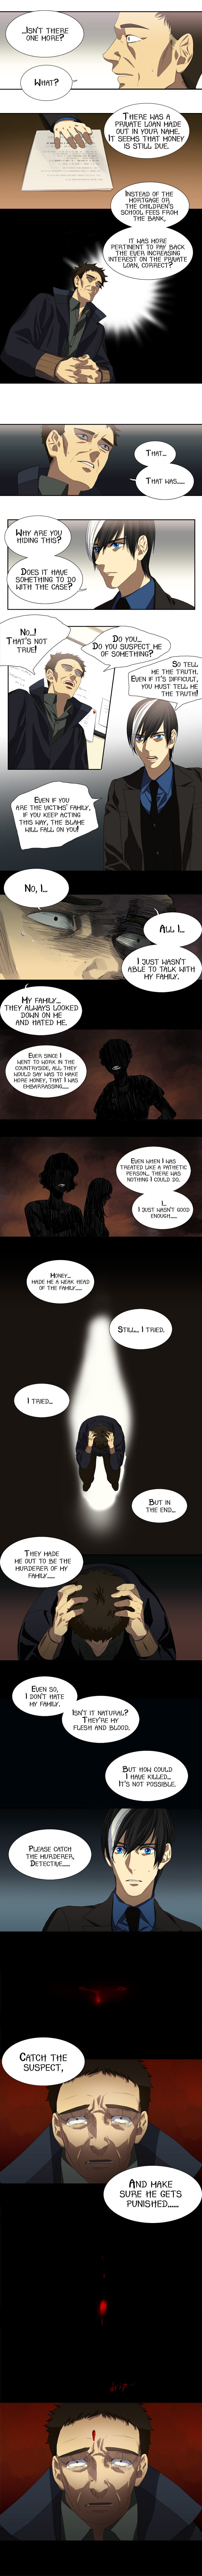 Supernatural Investigation Department 4 Page 2